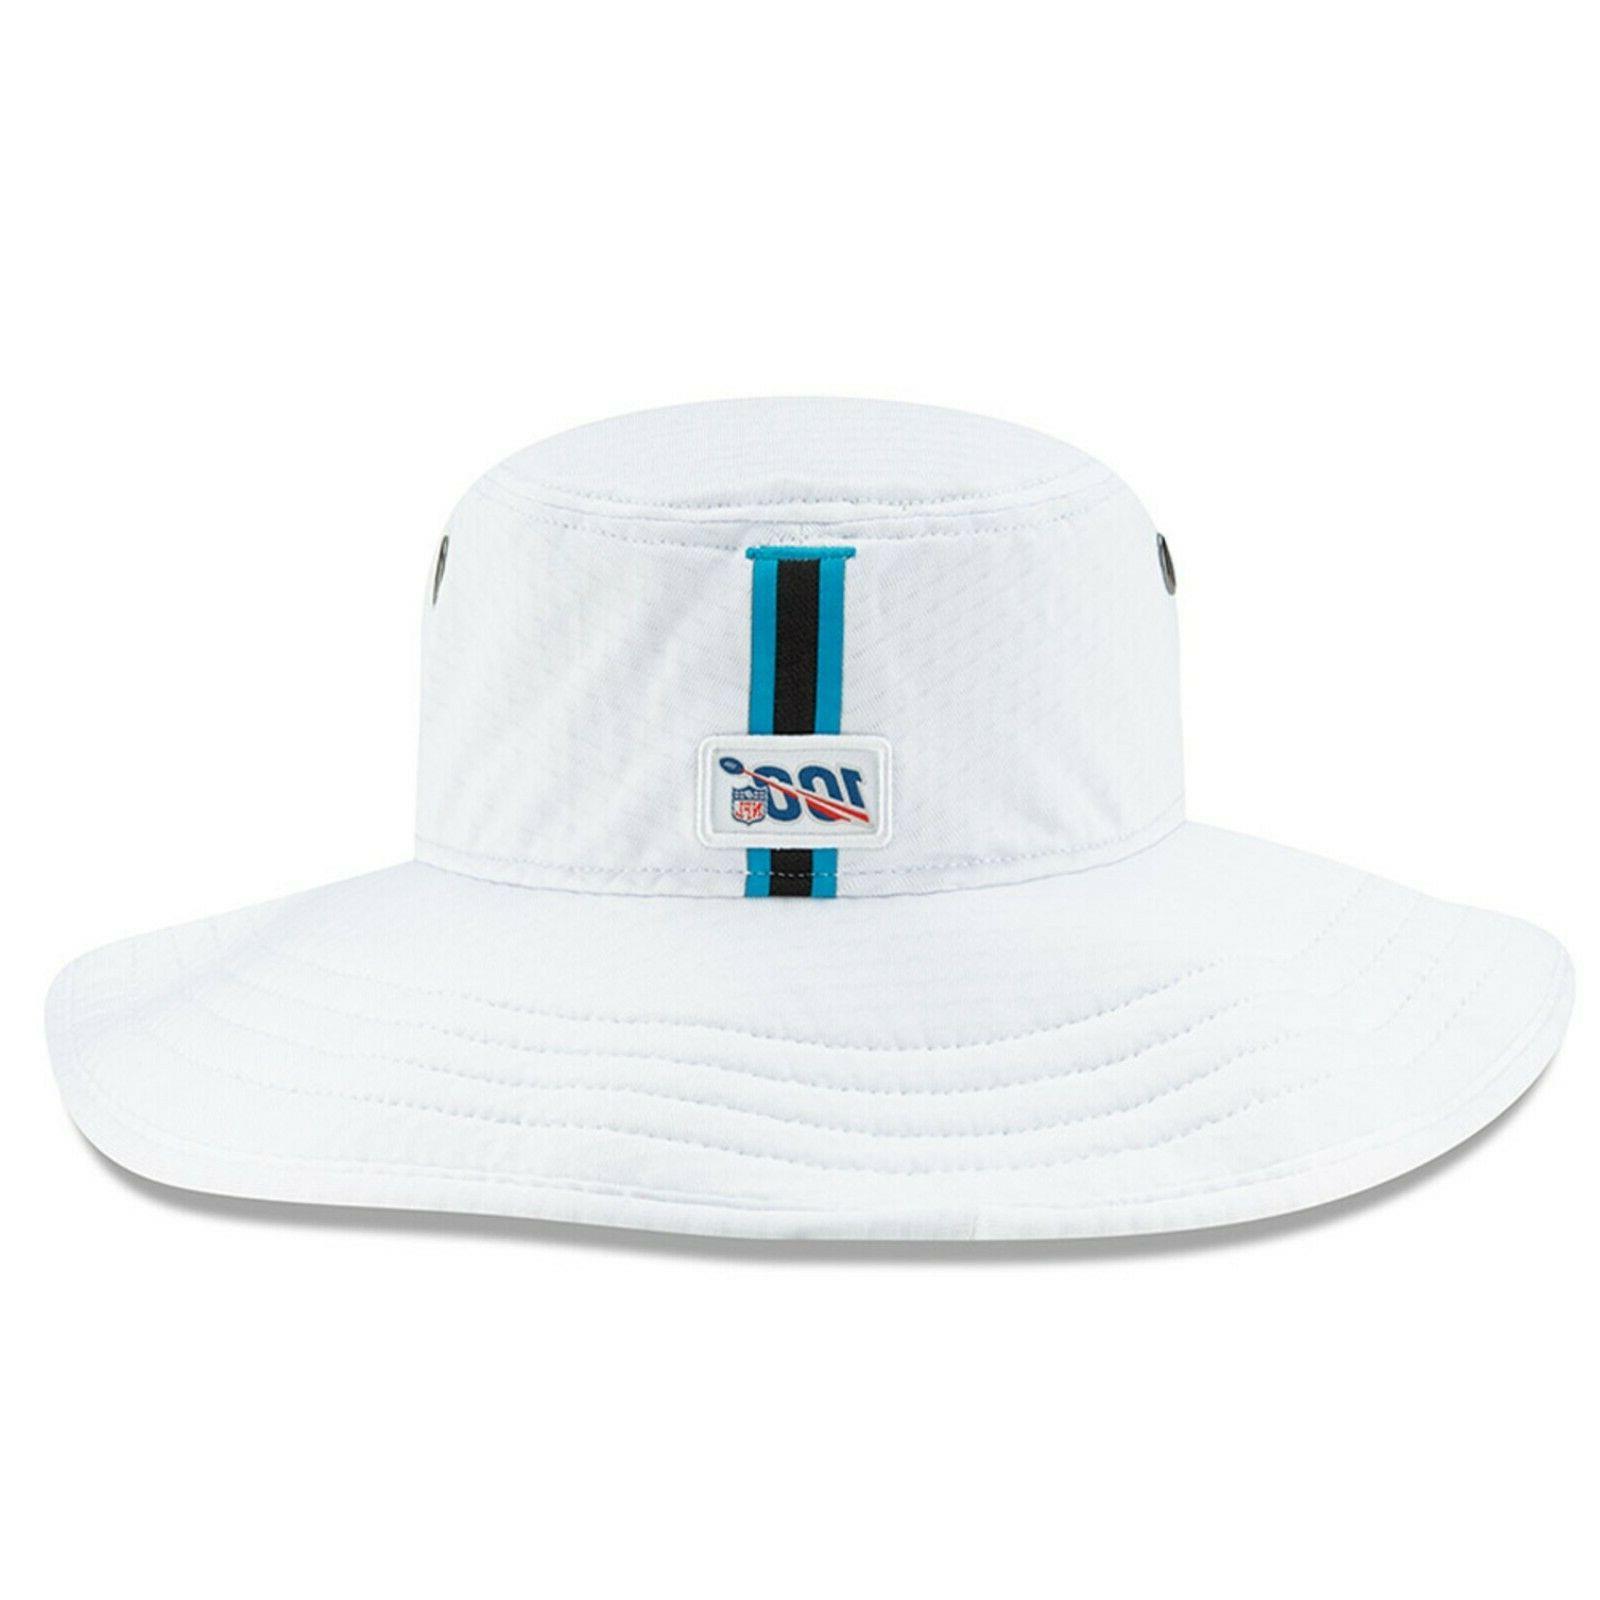 Carolina Panthers New White Hat - - OSFM